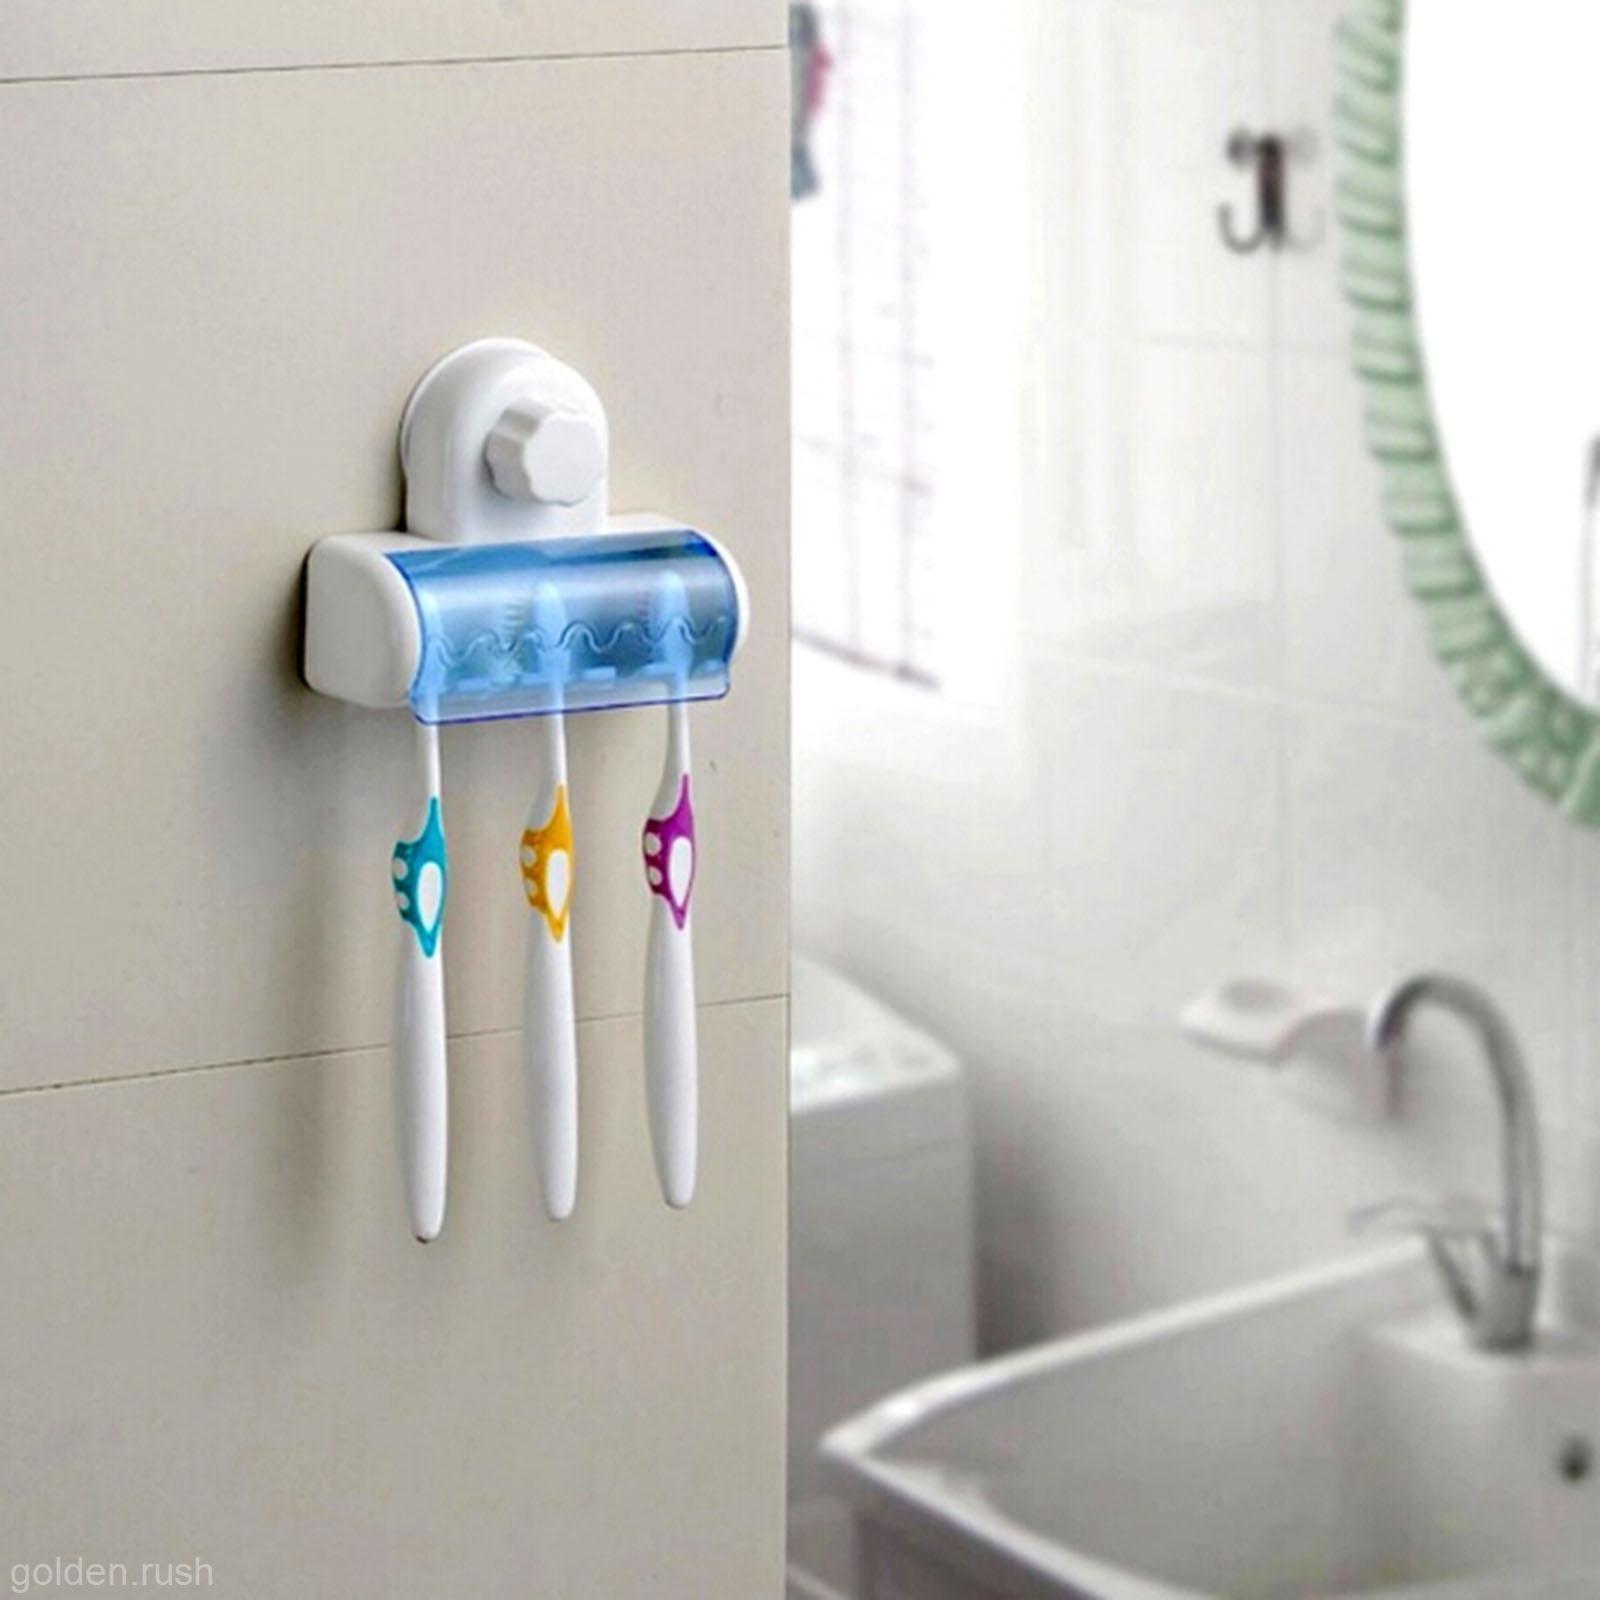 1X Family Home Bath Bathroom Toothbrush Wall Mount Holder Hanging ...